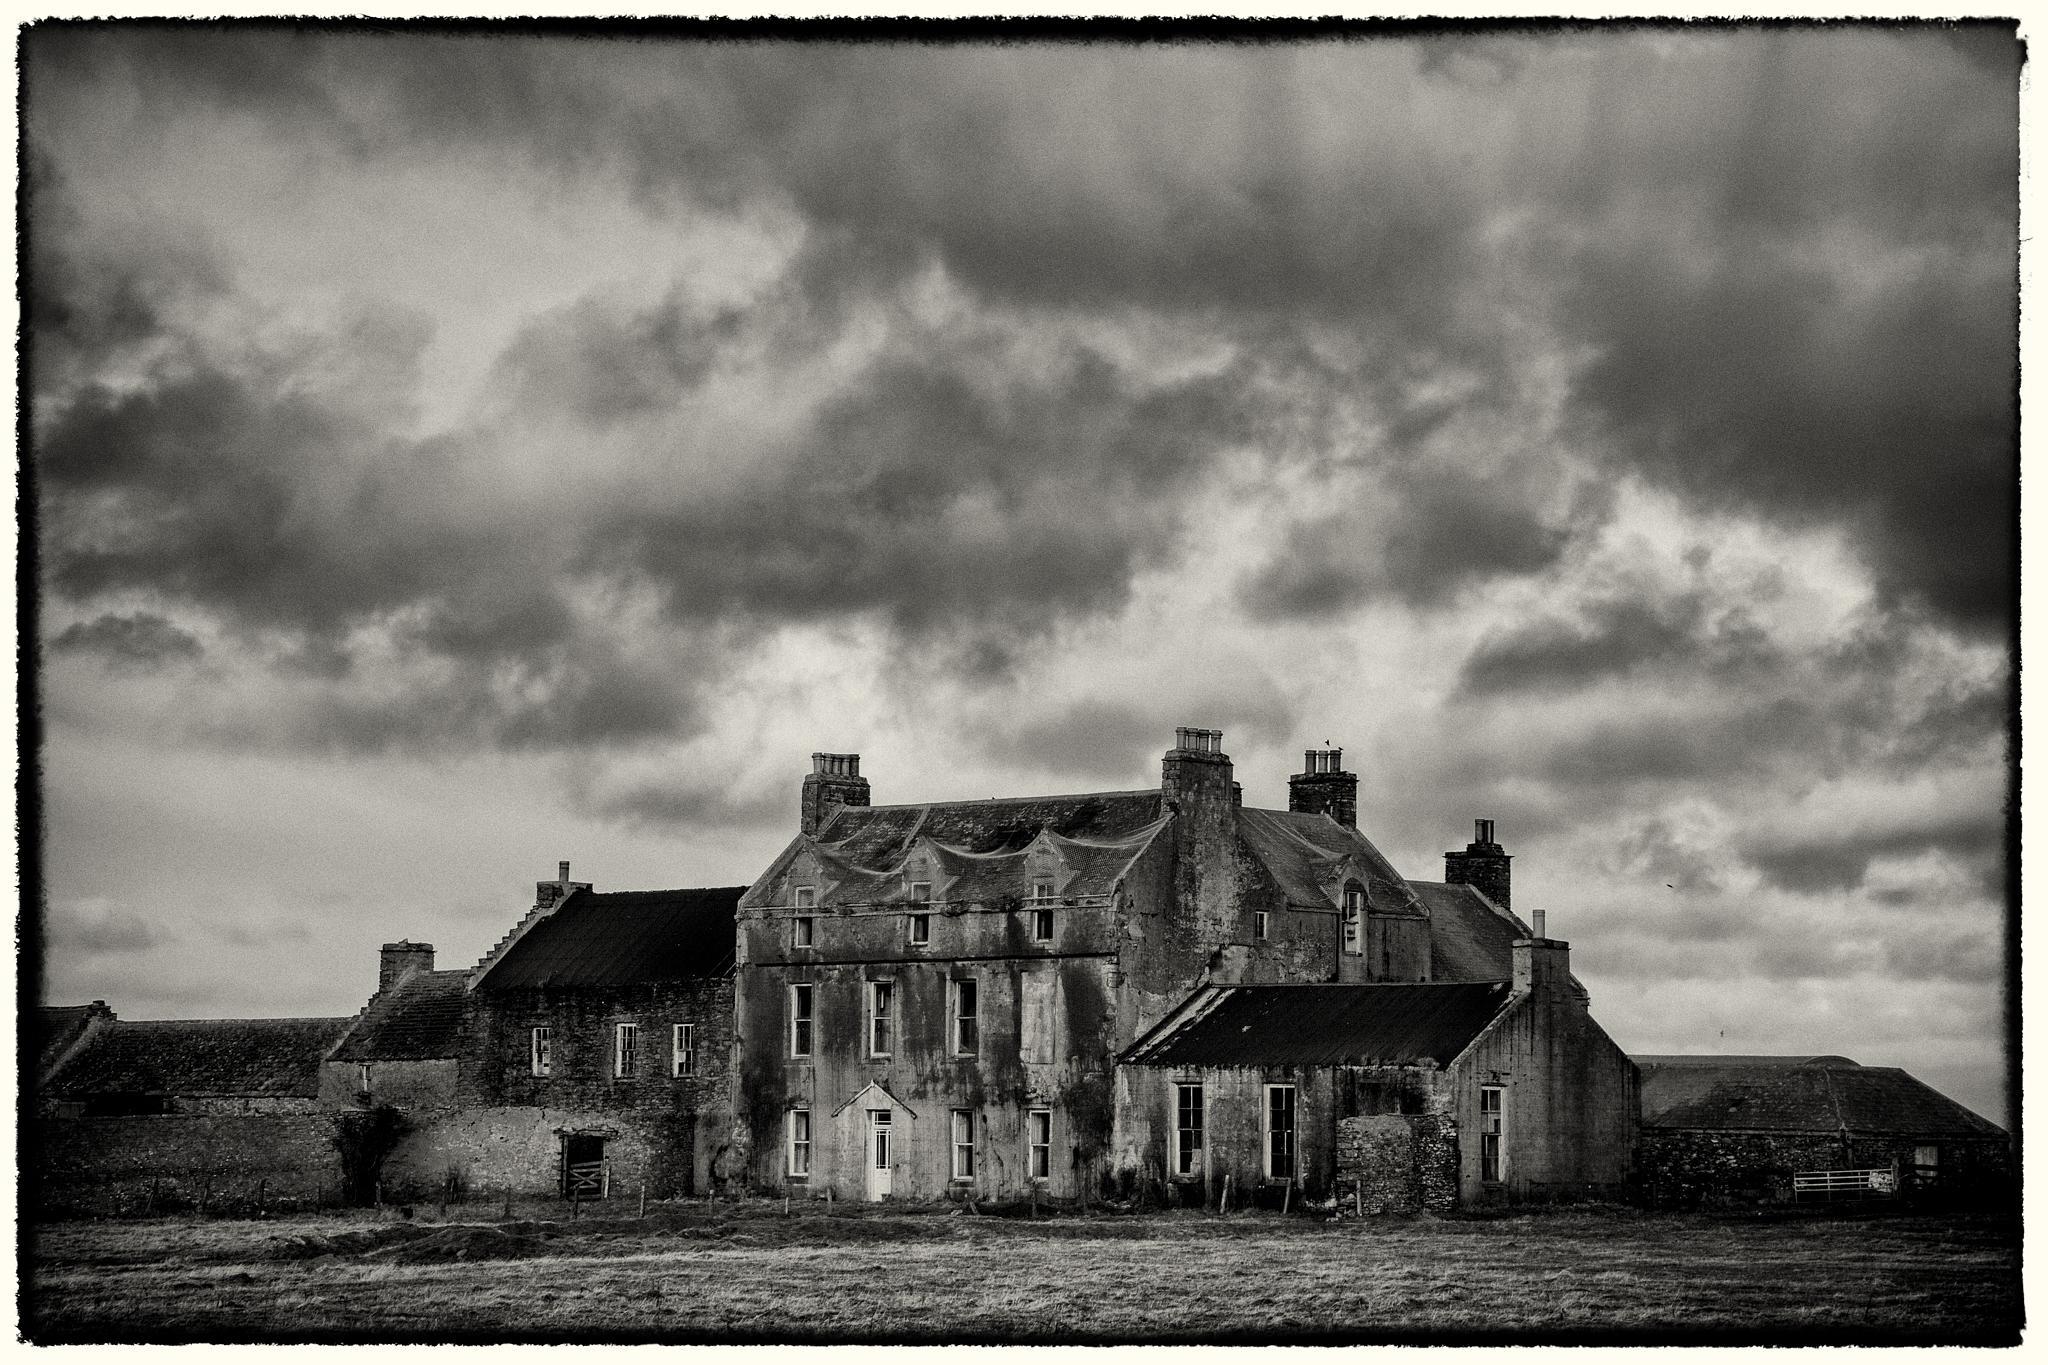 Scar House by isegarth